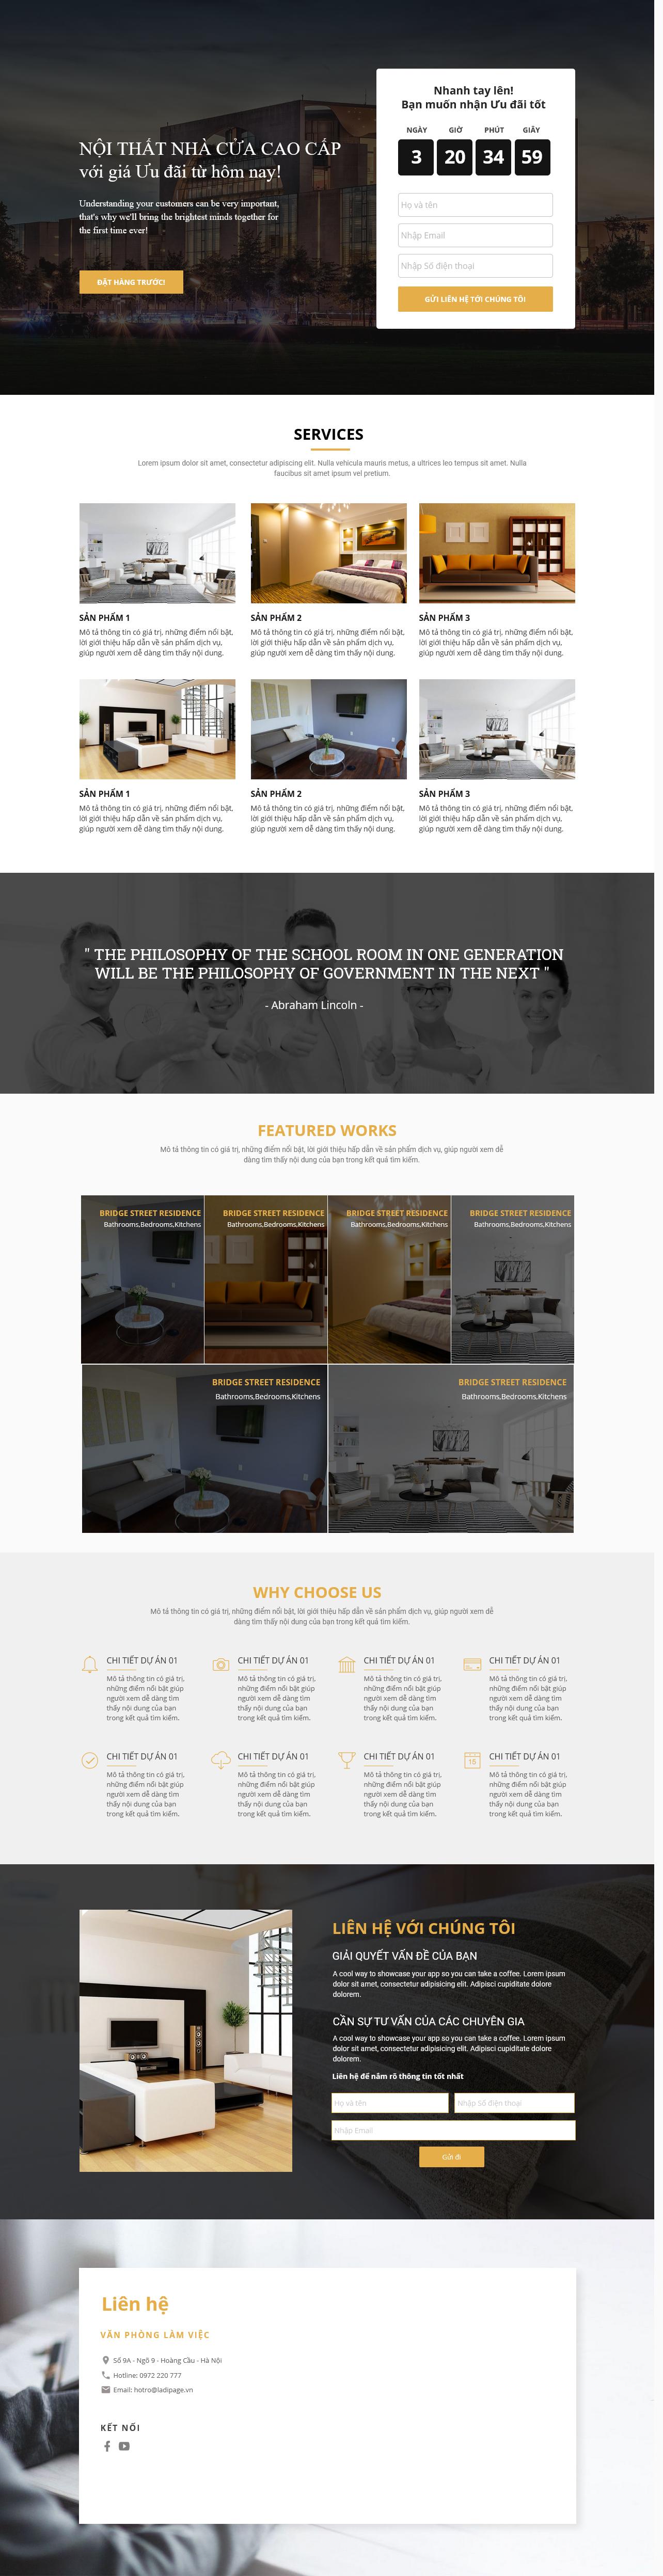 Thiết kế website Thiết kế webiste landingpage noi-that---ngoai-that Nội thất 13